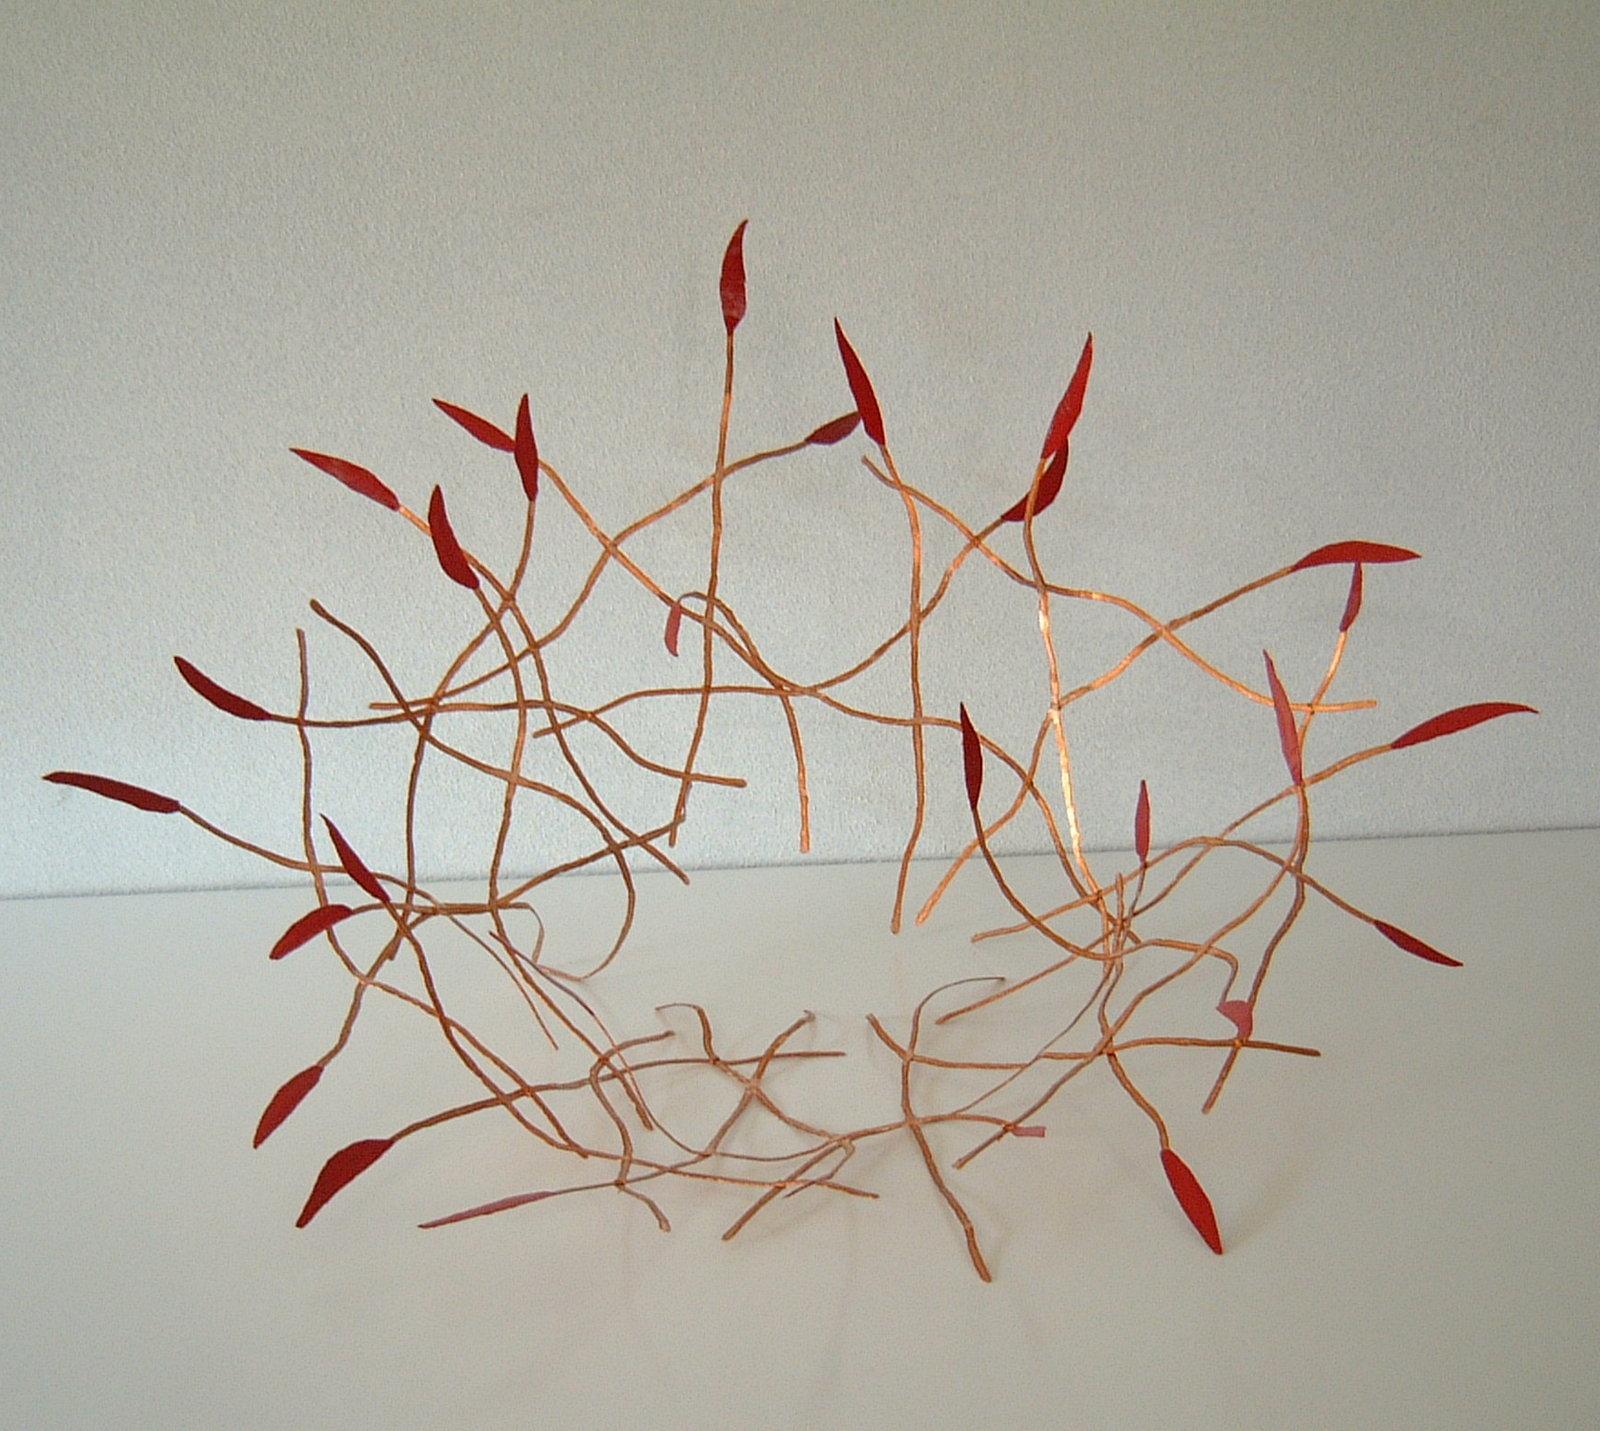 60 x 45 x 30 cm<br>eucalyptus, copper